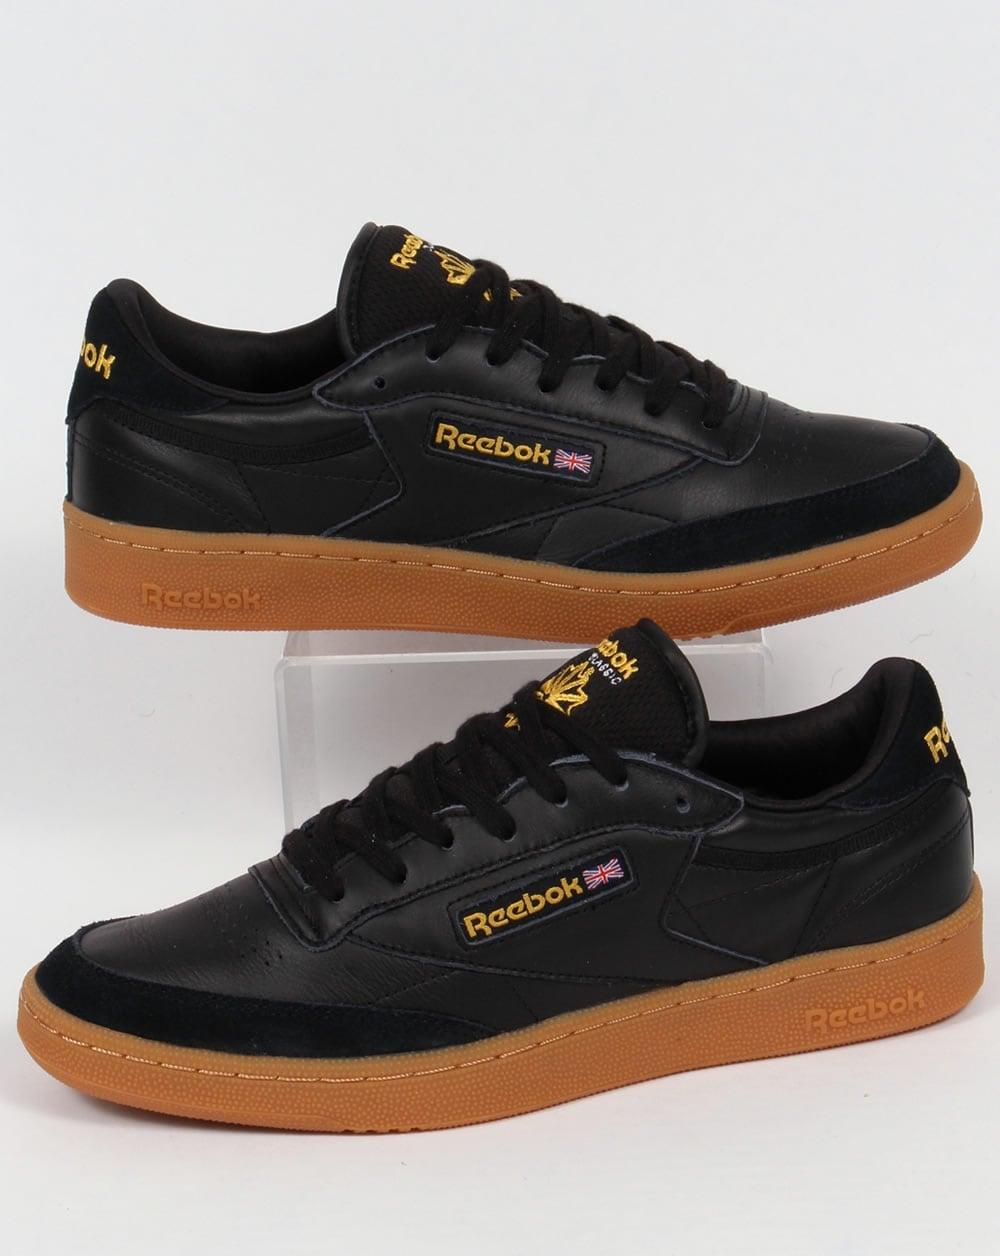 efede82c388 Reebok Reebok Club C 85 Trainers Black Yellow